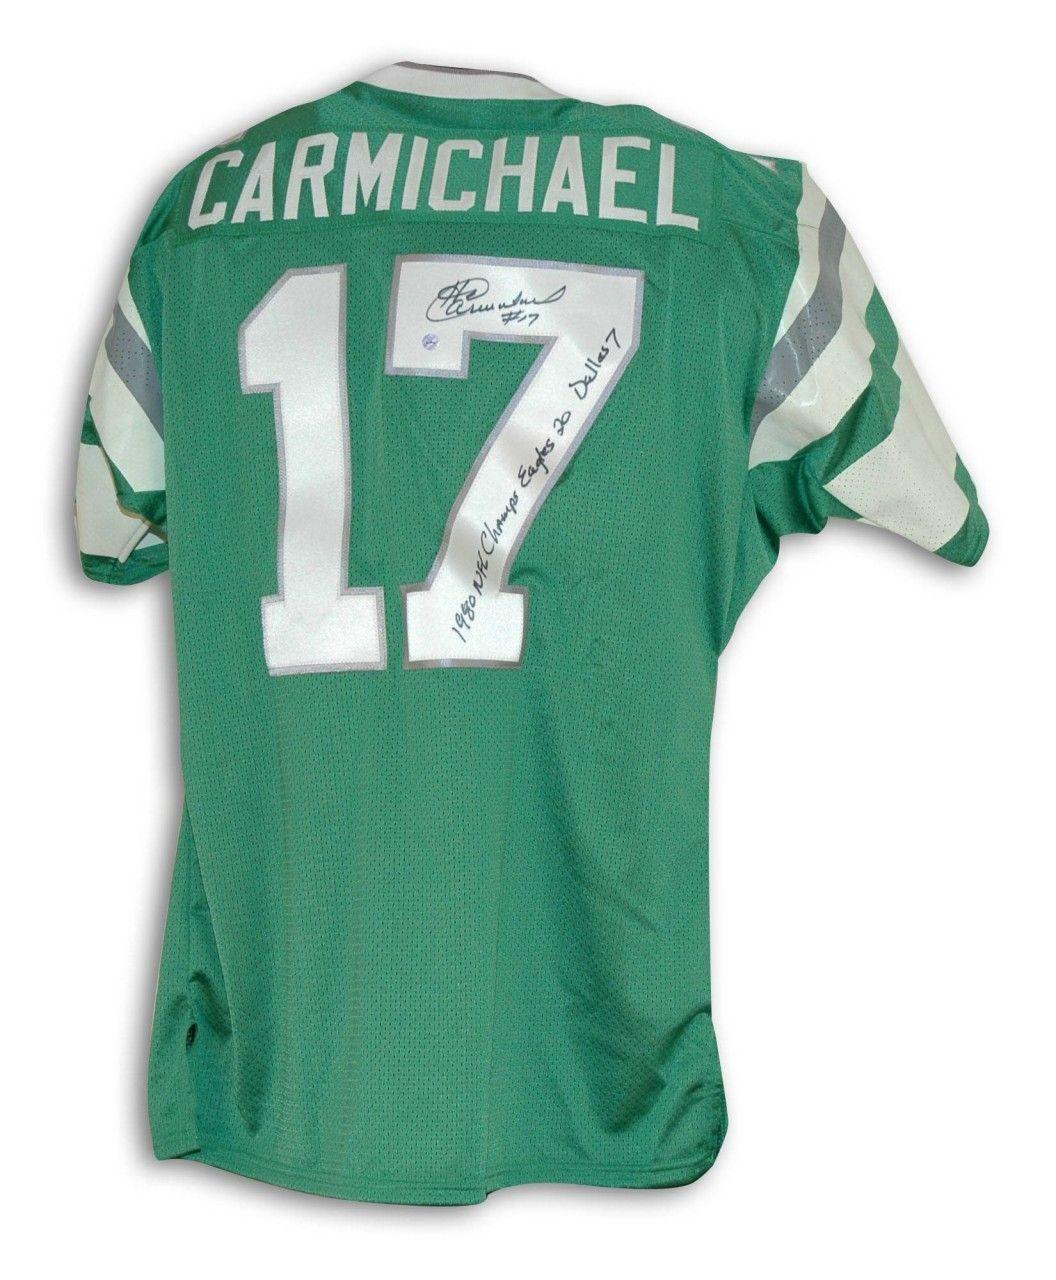 huge selection of 3dbcf fd909 AAA Sports Memorabilia LLC - Harold Carmichael Philadelphia ...